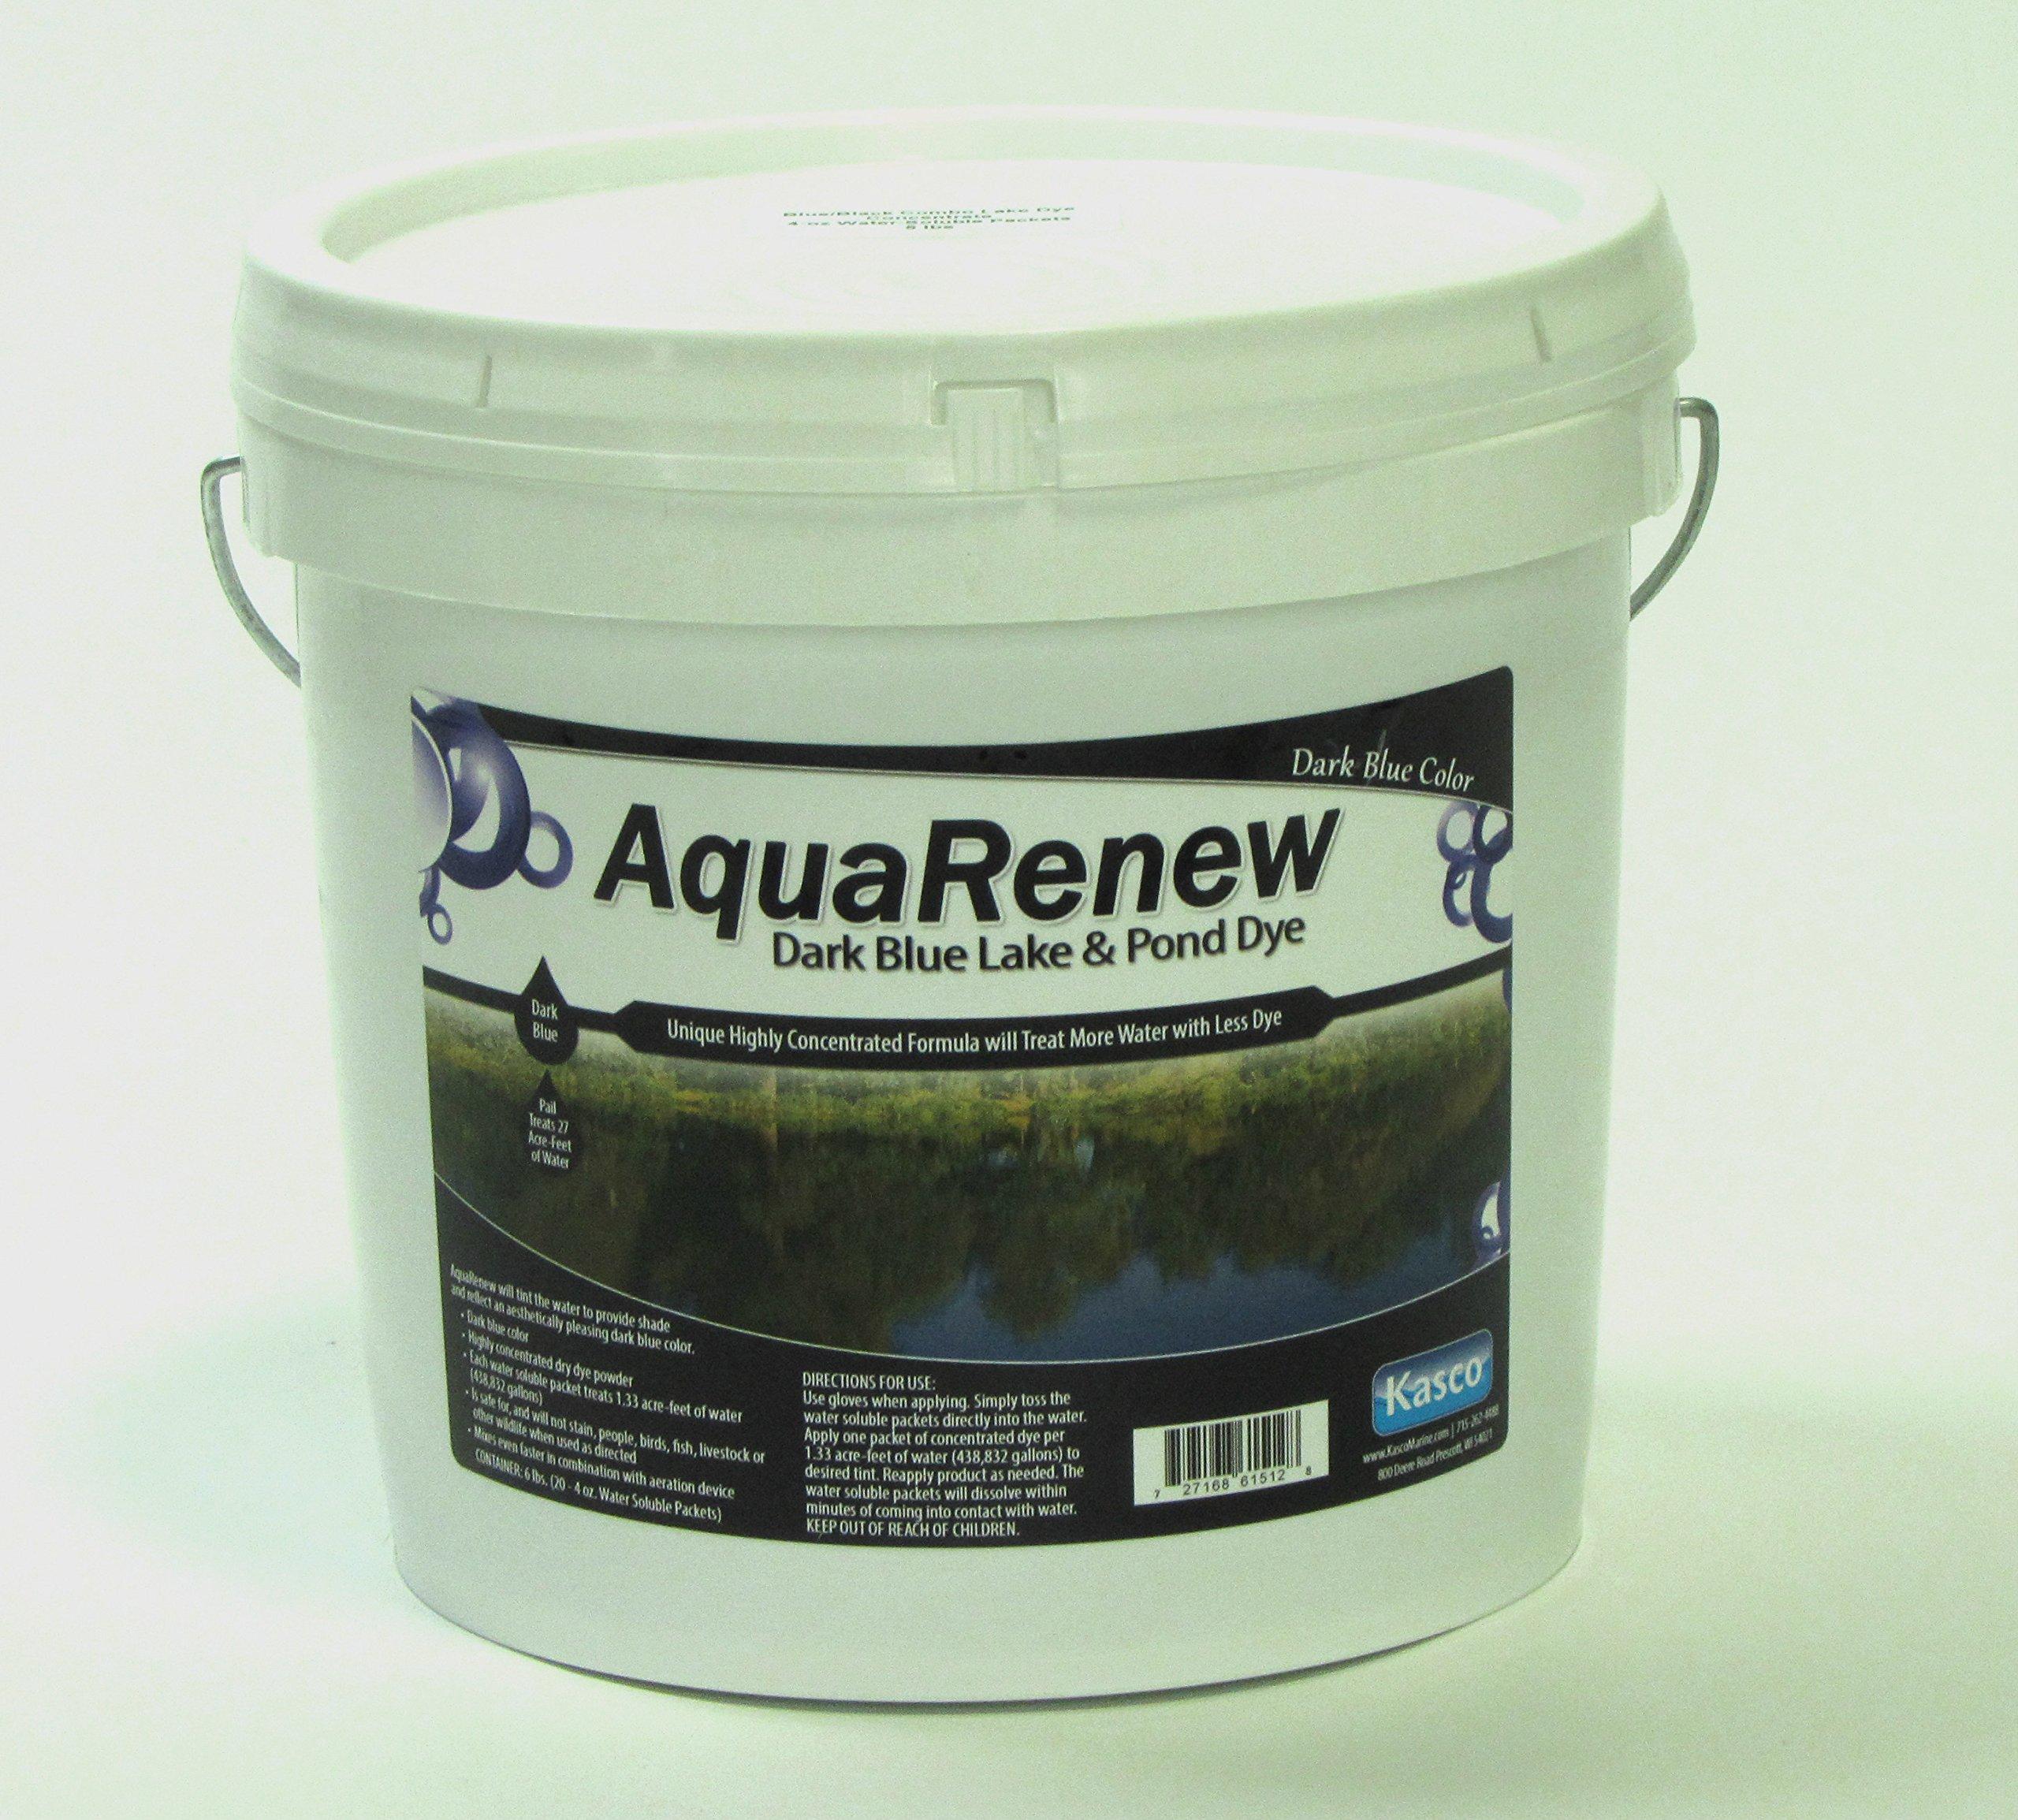 AquaRenew Eco Safe Pond & Lake Water Dye - 6 lbs DARK BLUE